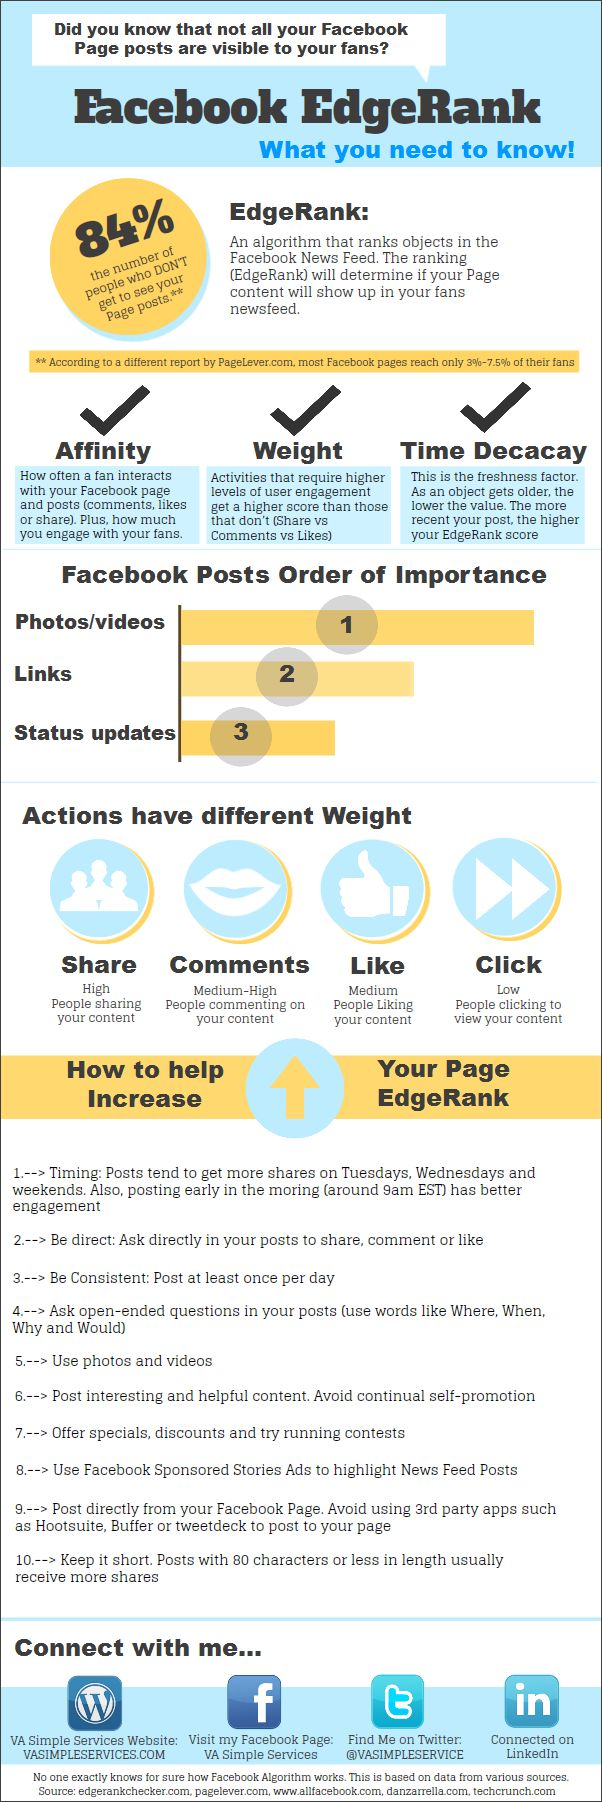 Facebook Edgerank #infographic